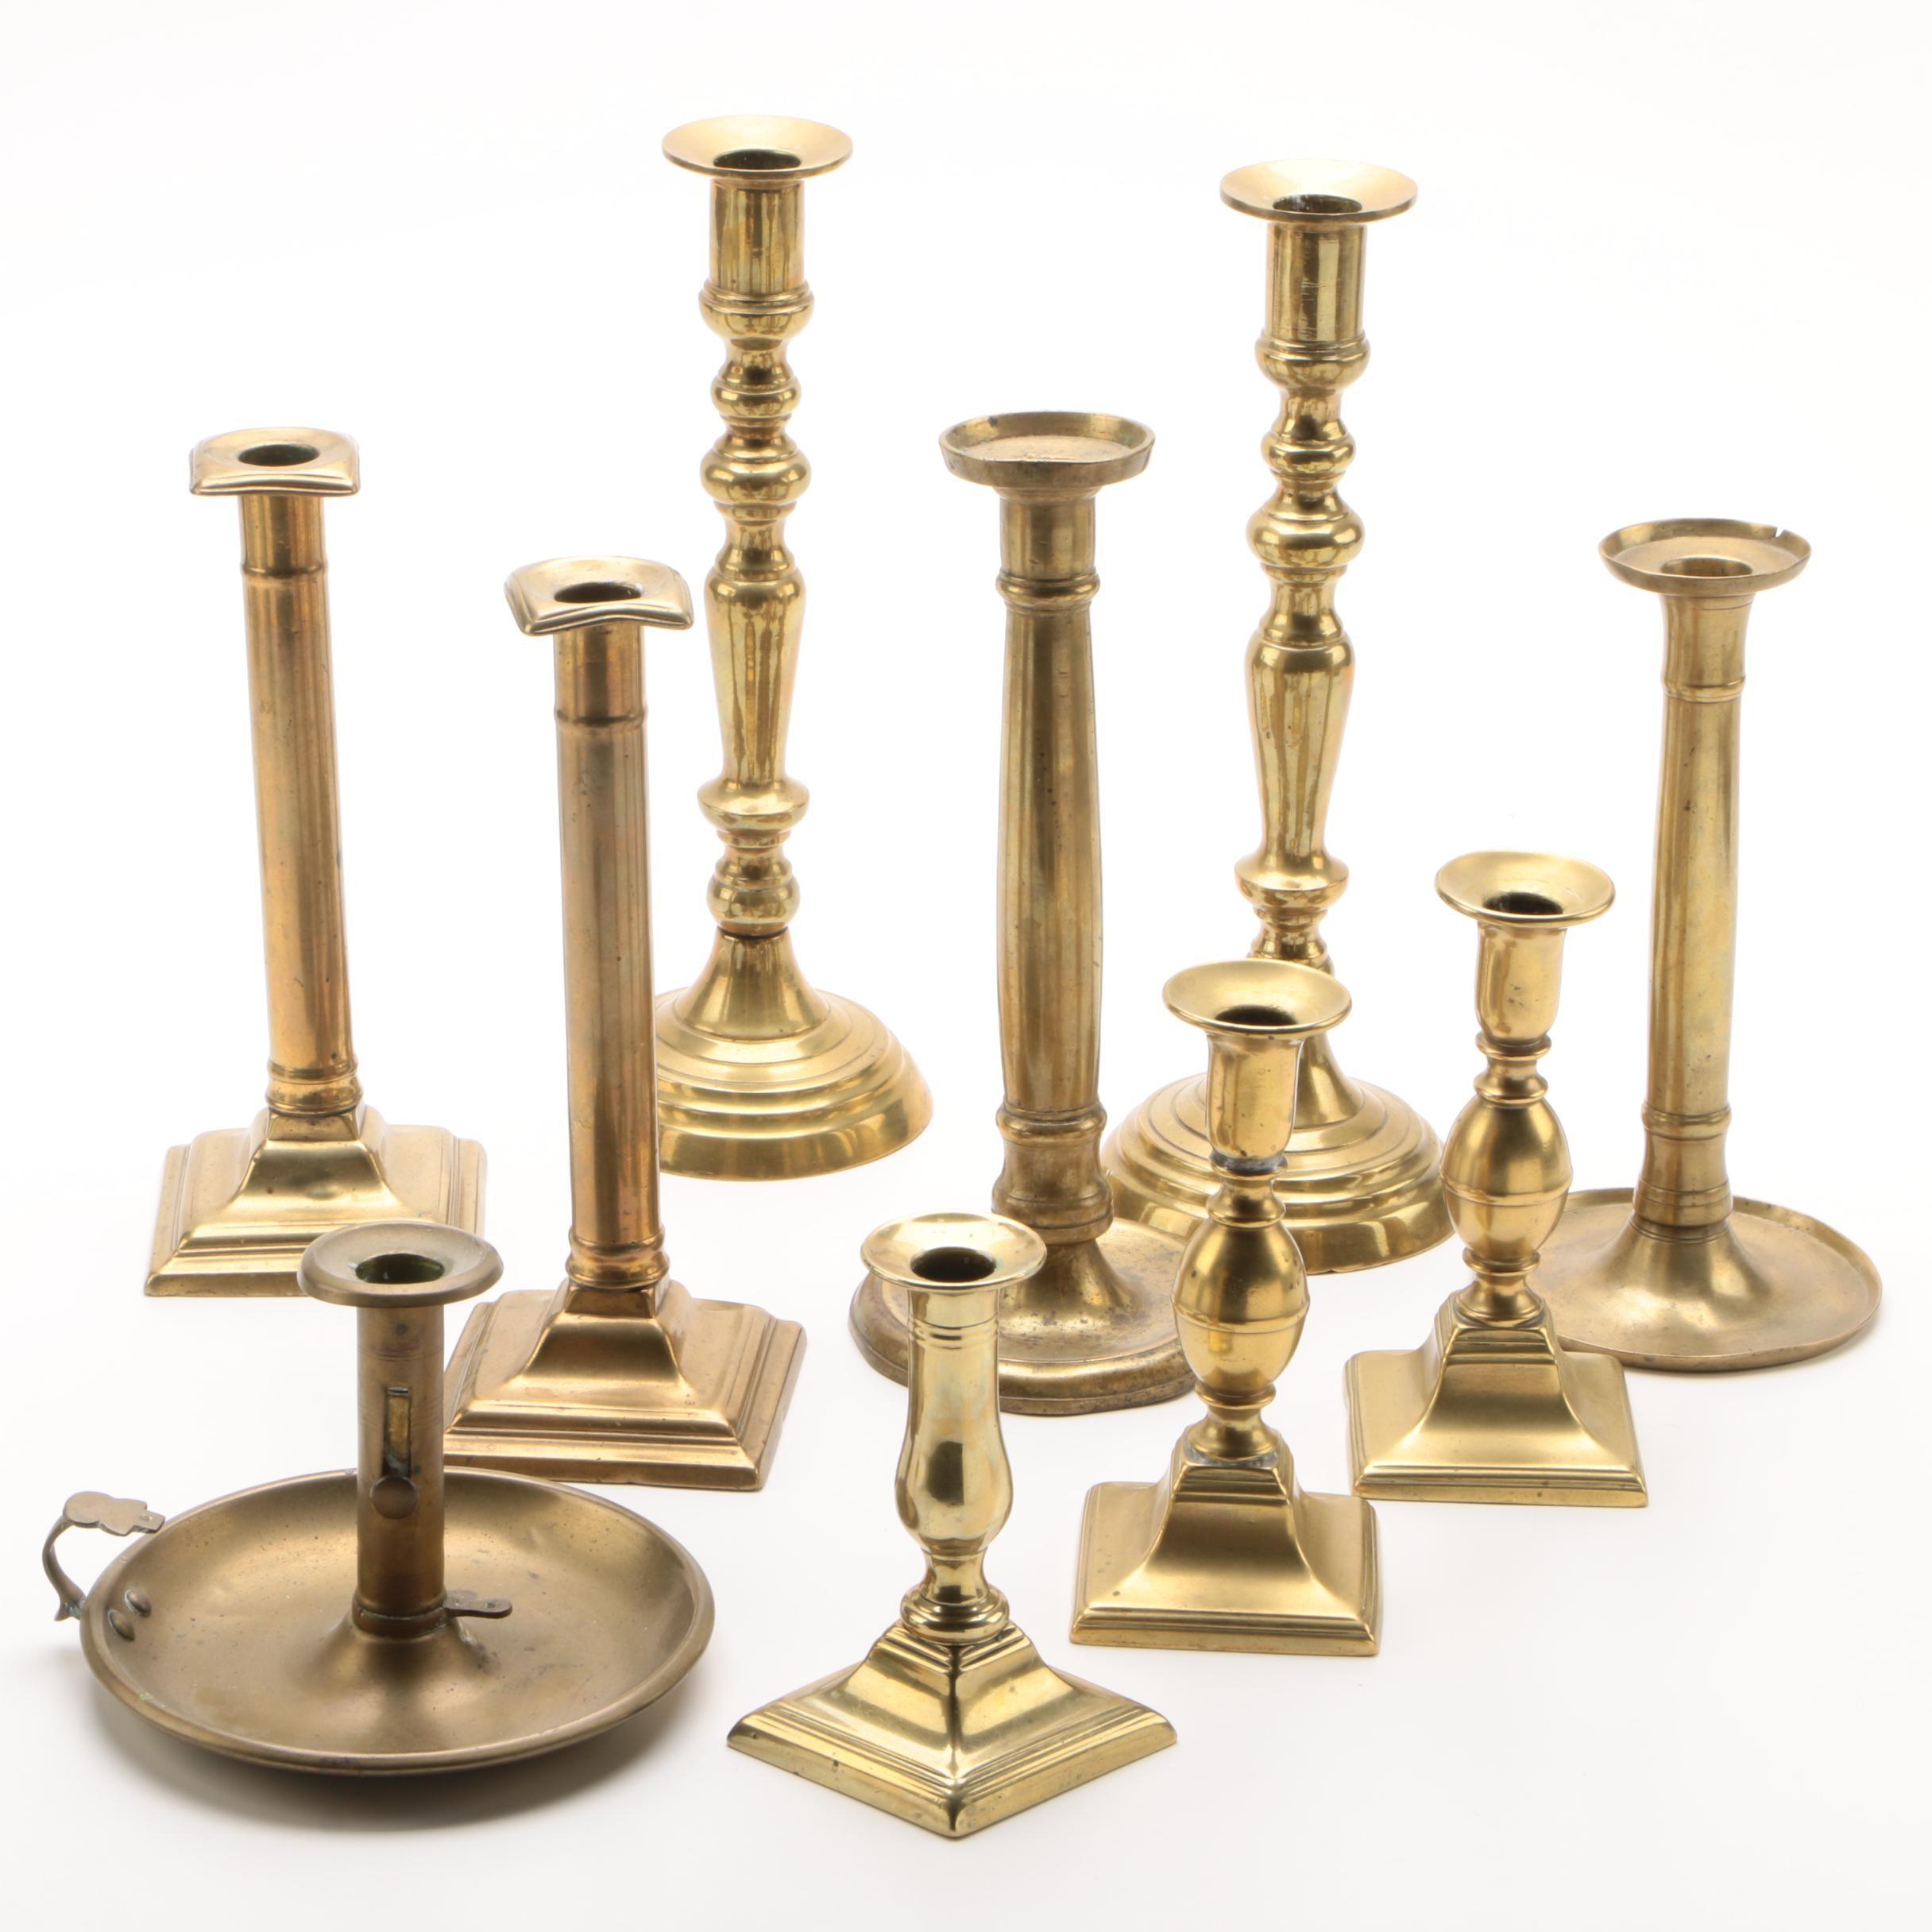 Brass Candlesticks and Chamberstick, Mid-Century